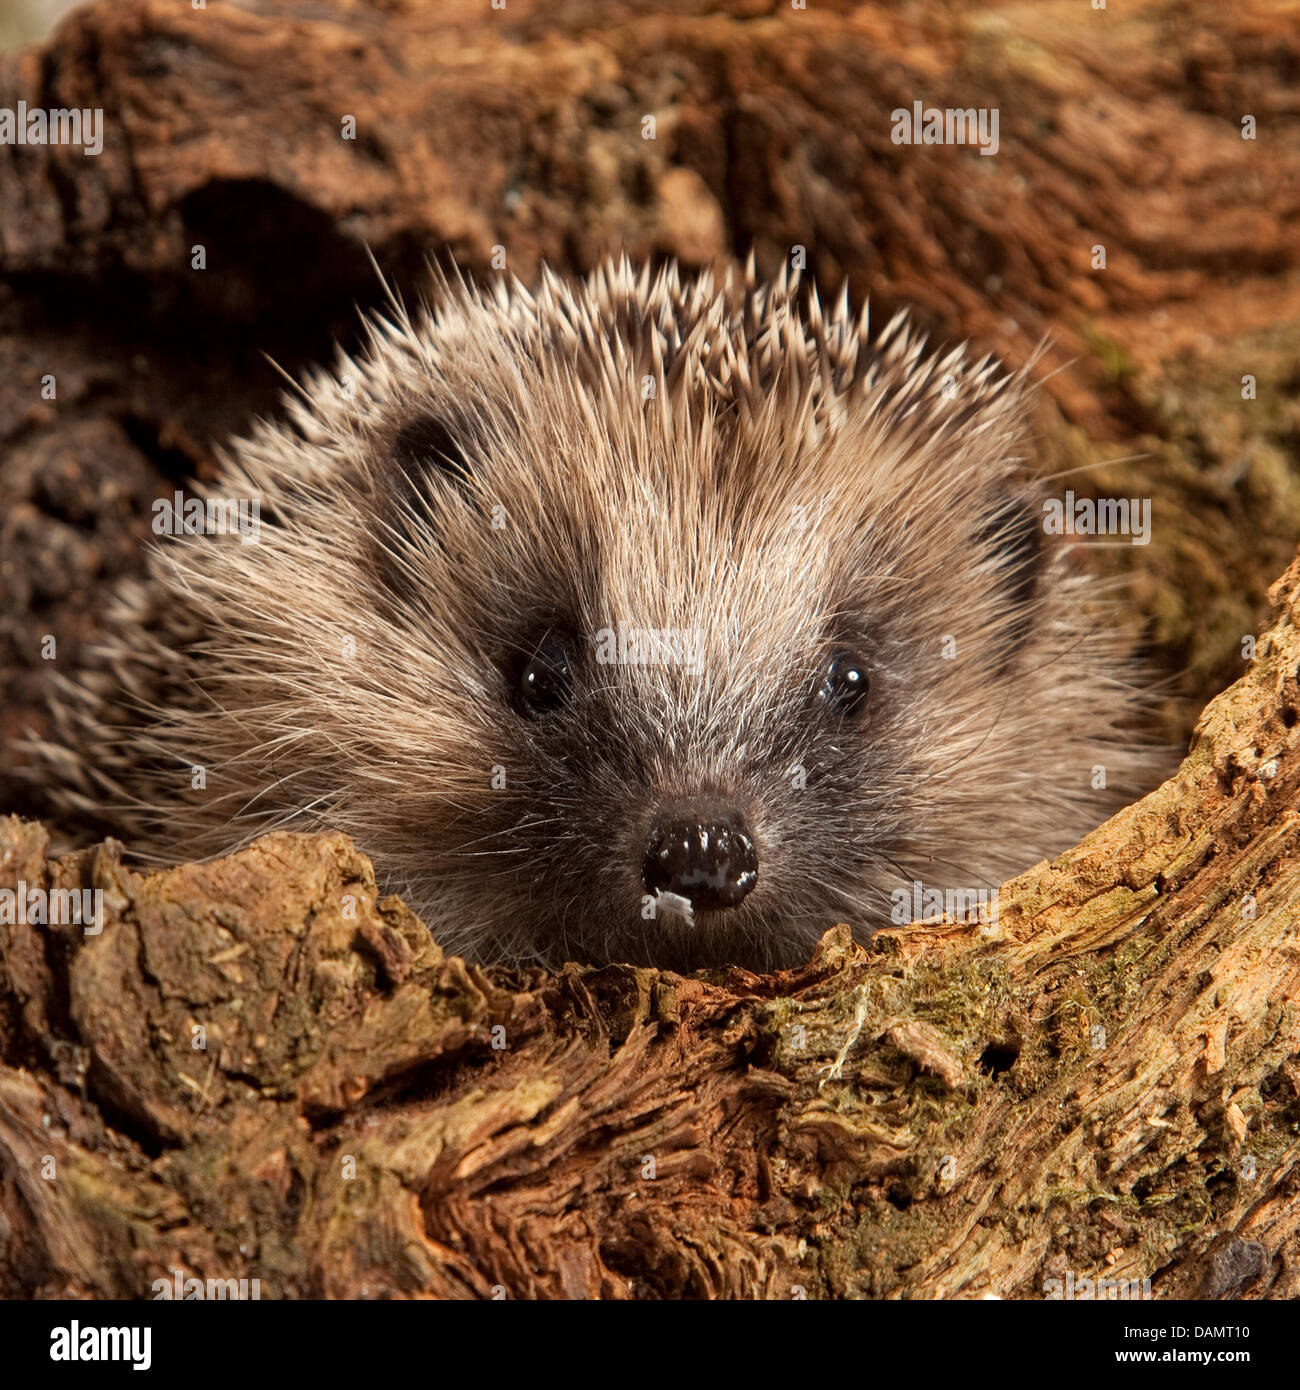 European hedgehog hiding in log - Stock Image